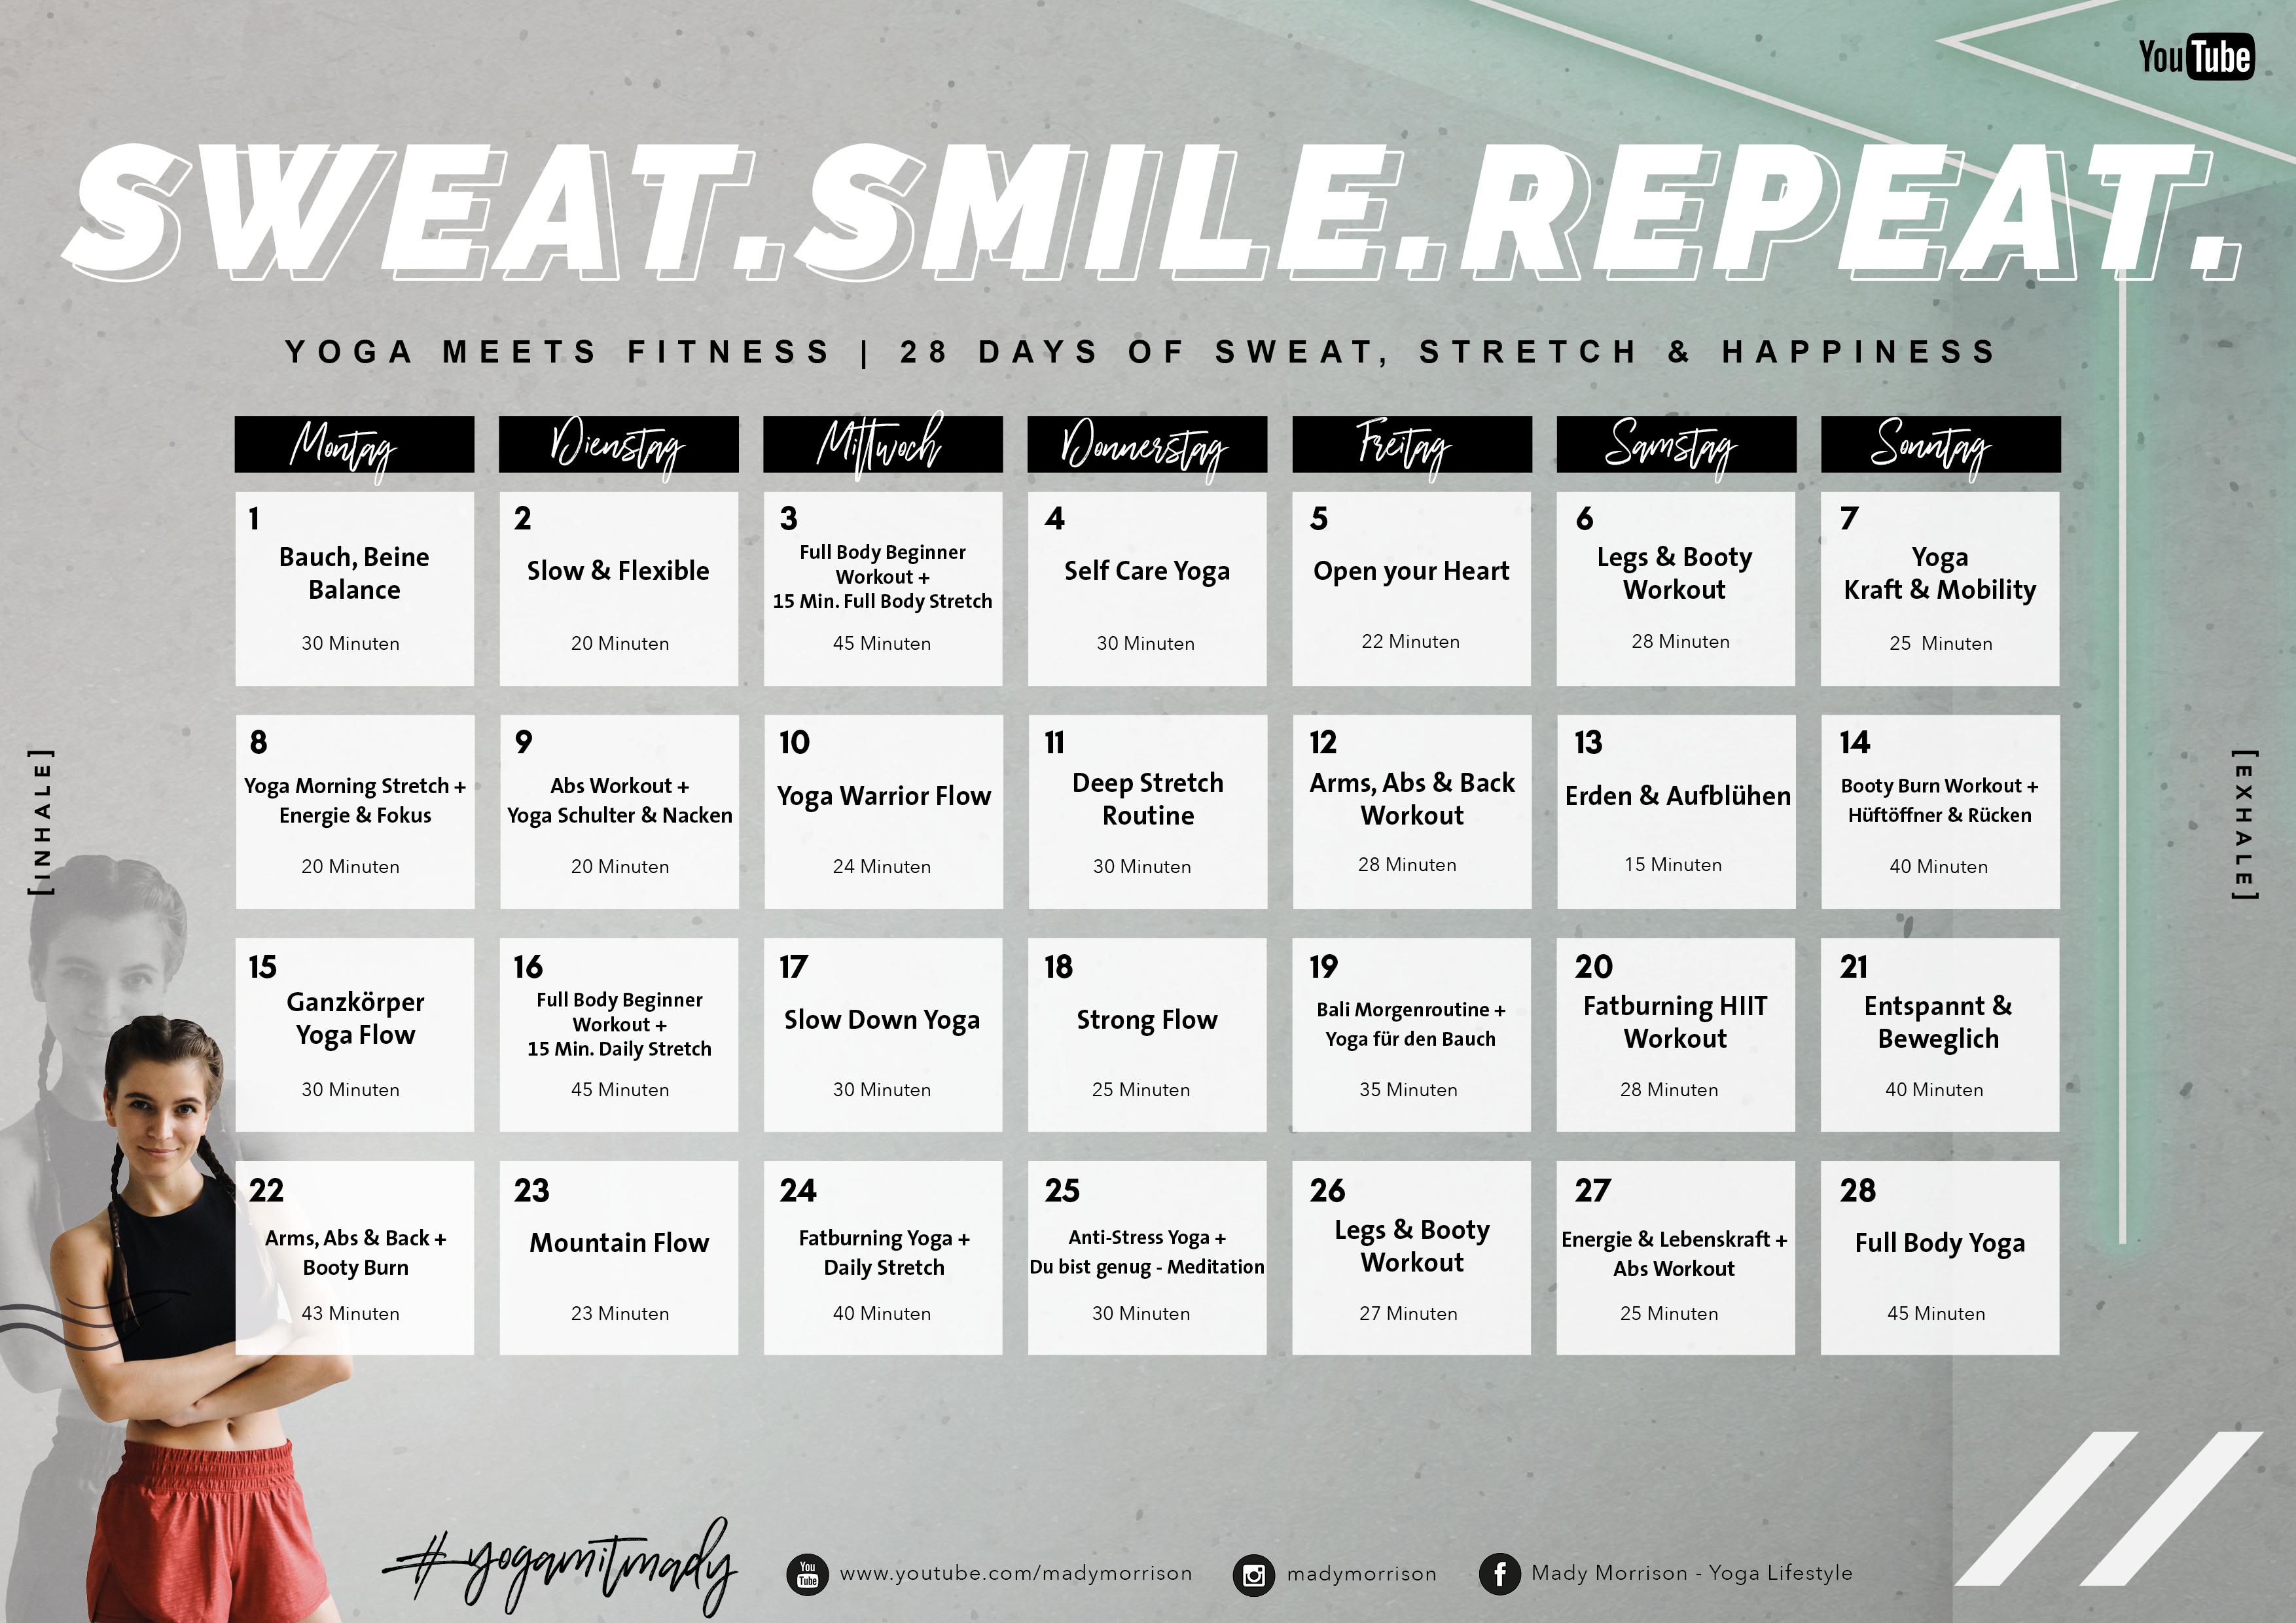 sweat-smile-repeat-by-madymorrison-NEU-2